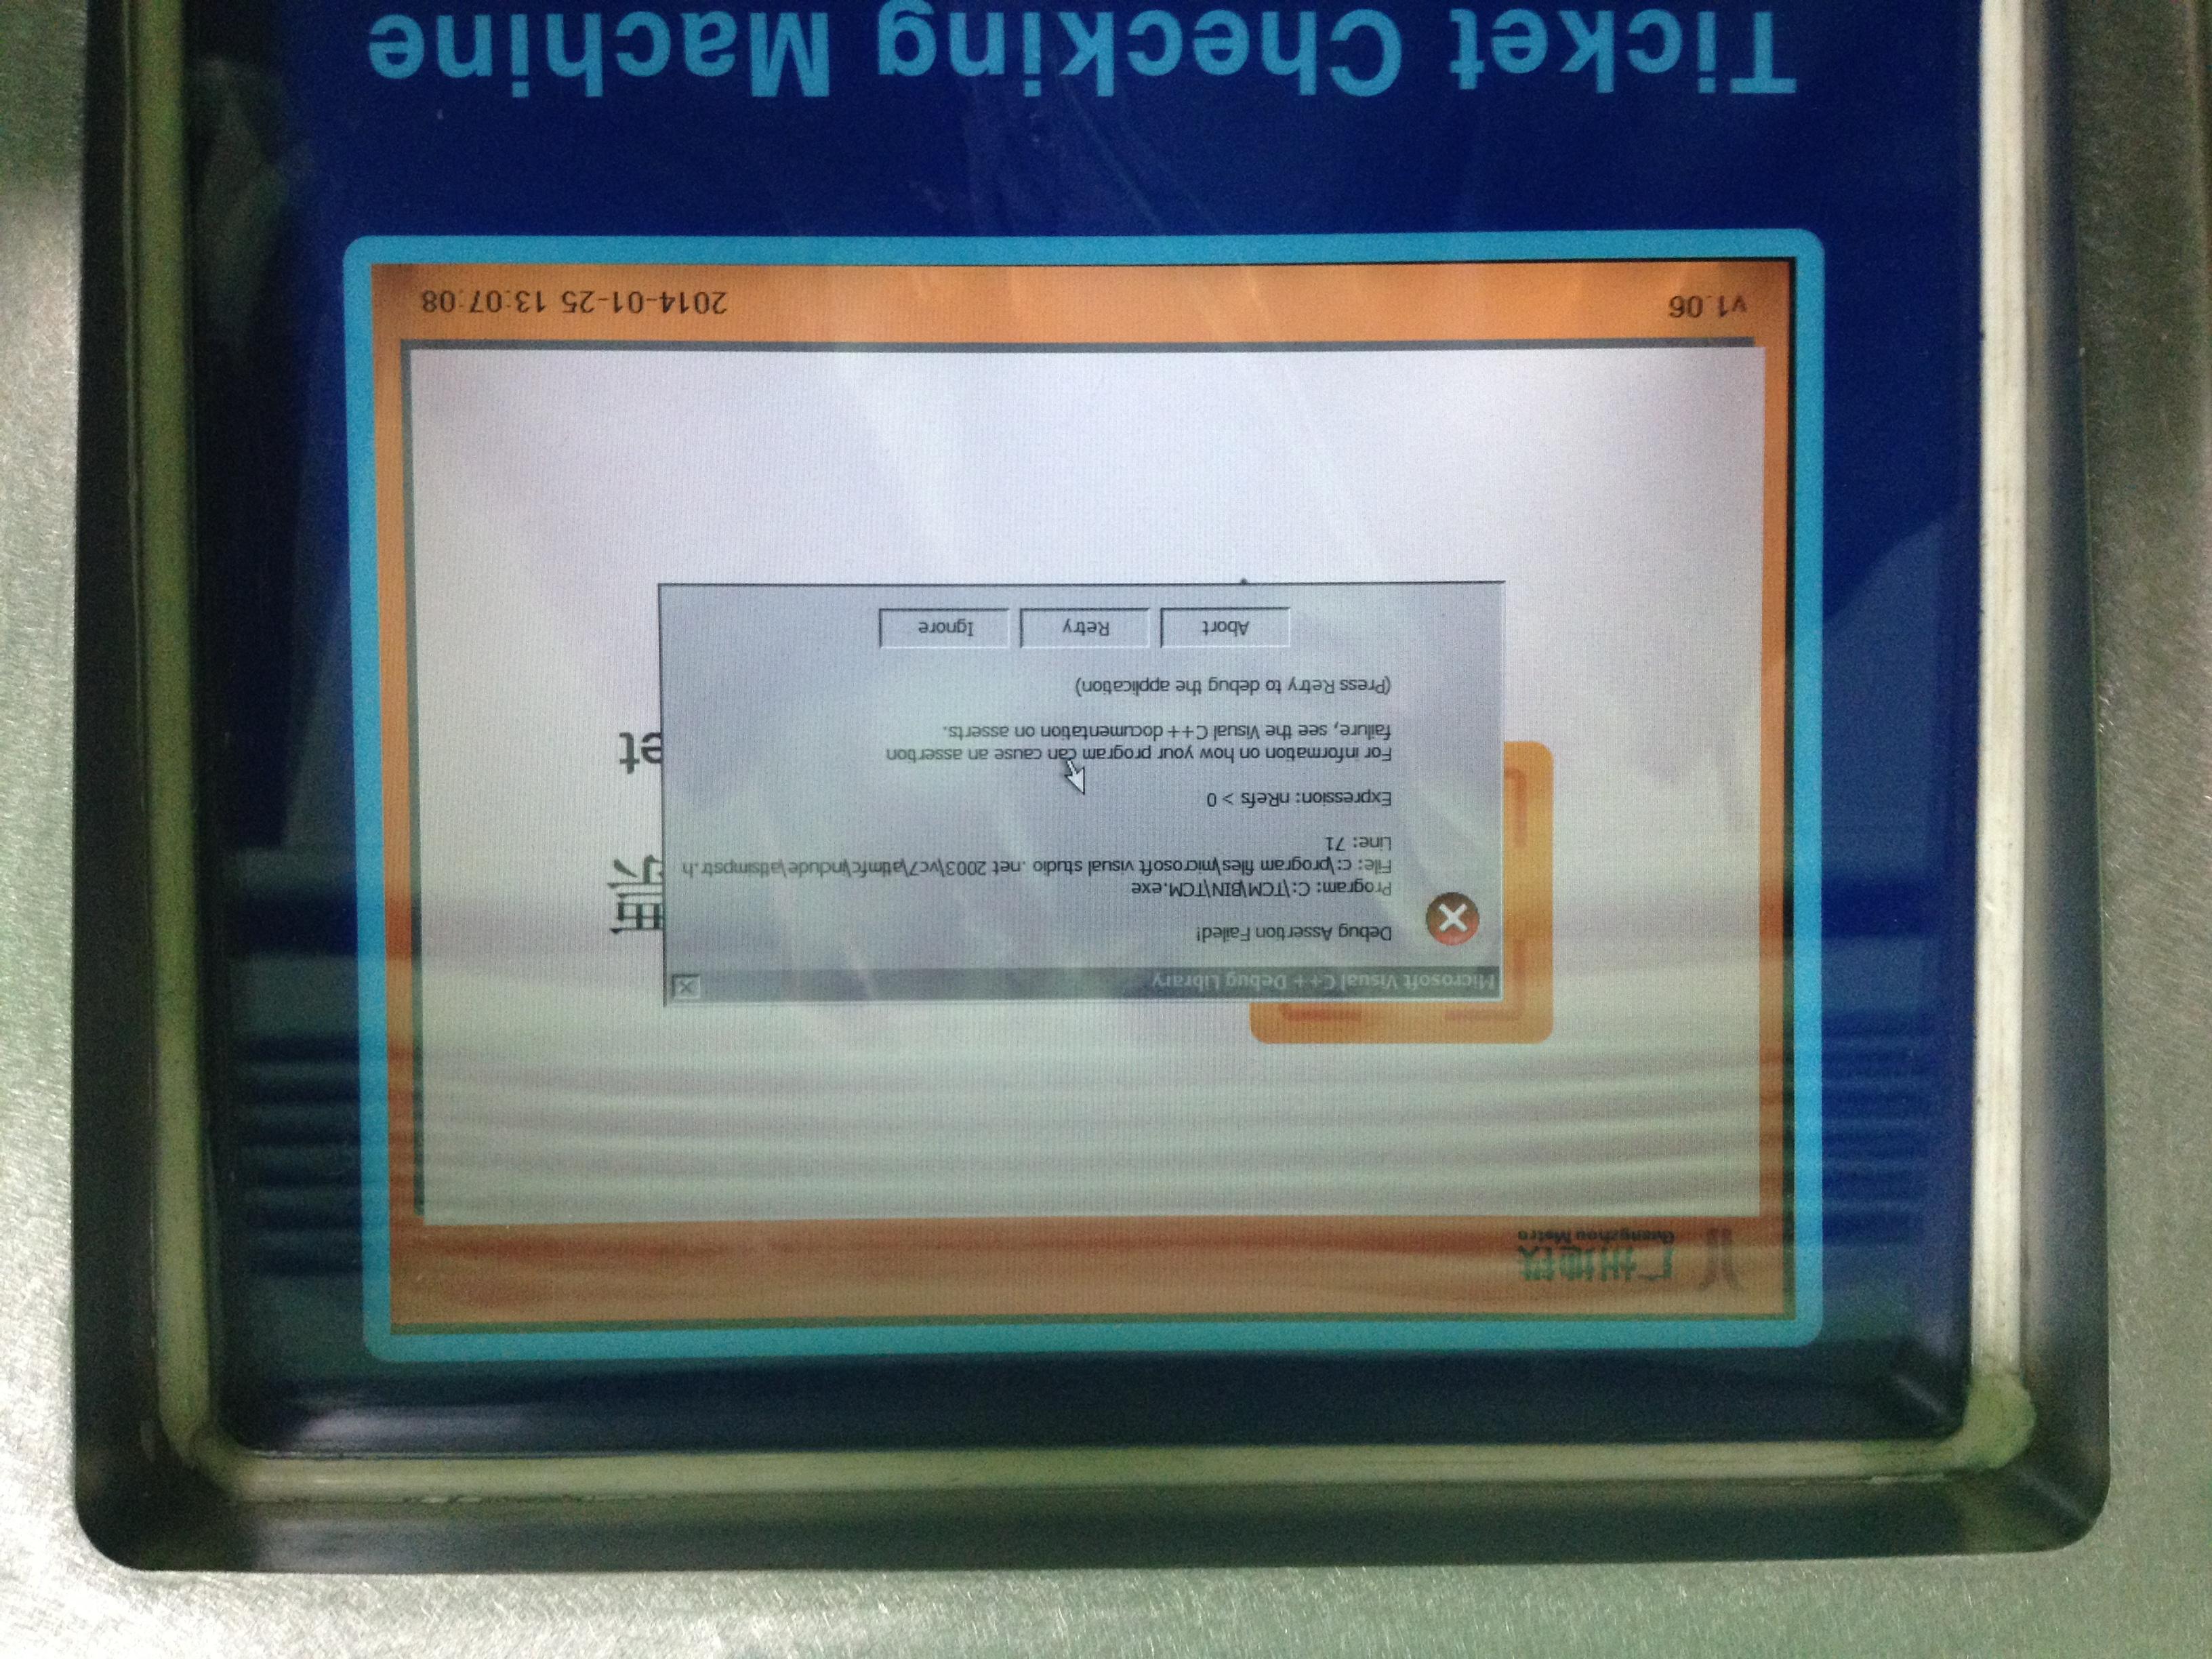 File:Guangzhou metro ticket machine failure 2014-01-25 jpg